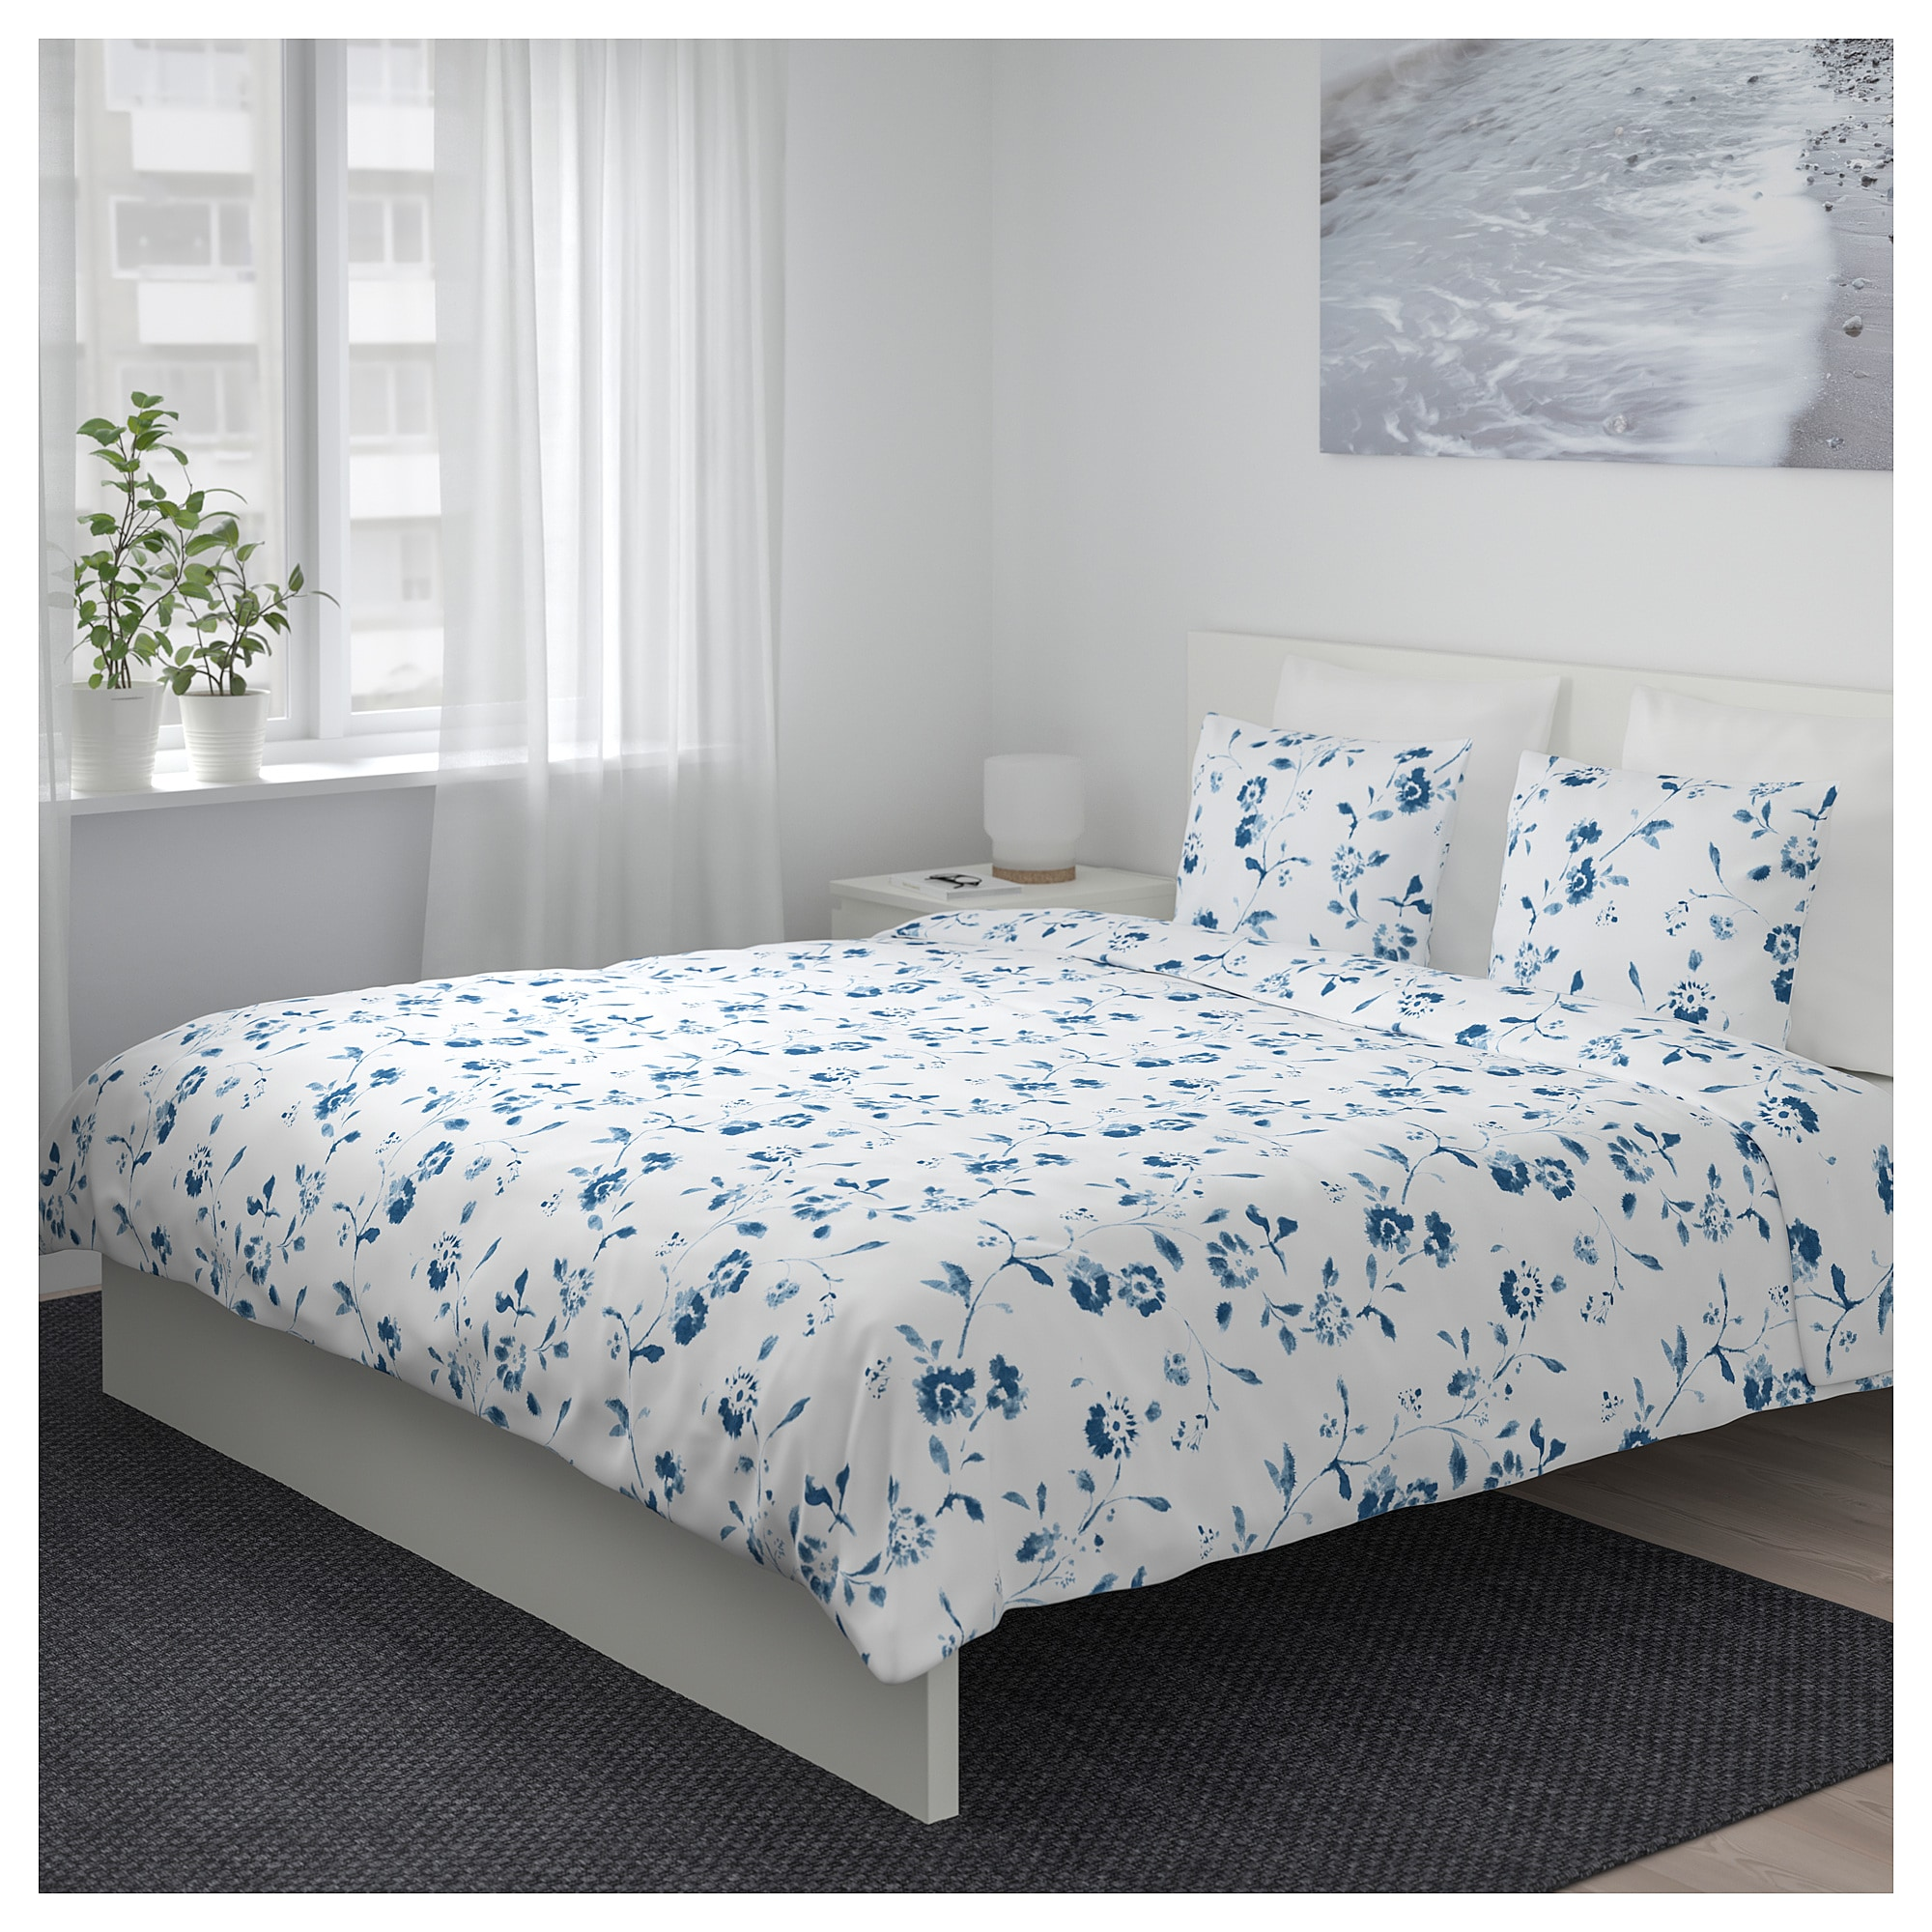 ikea  blÅgran duvet cover and pillowcases white blue